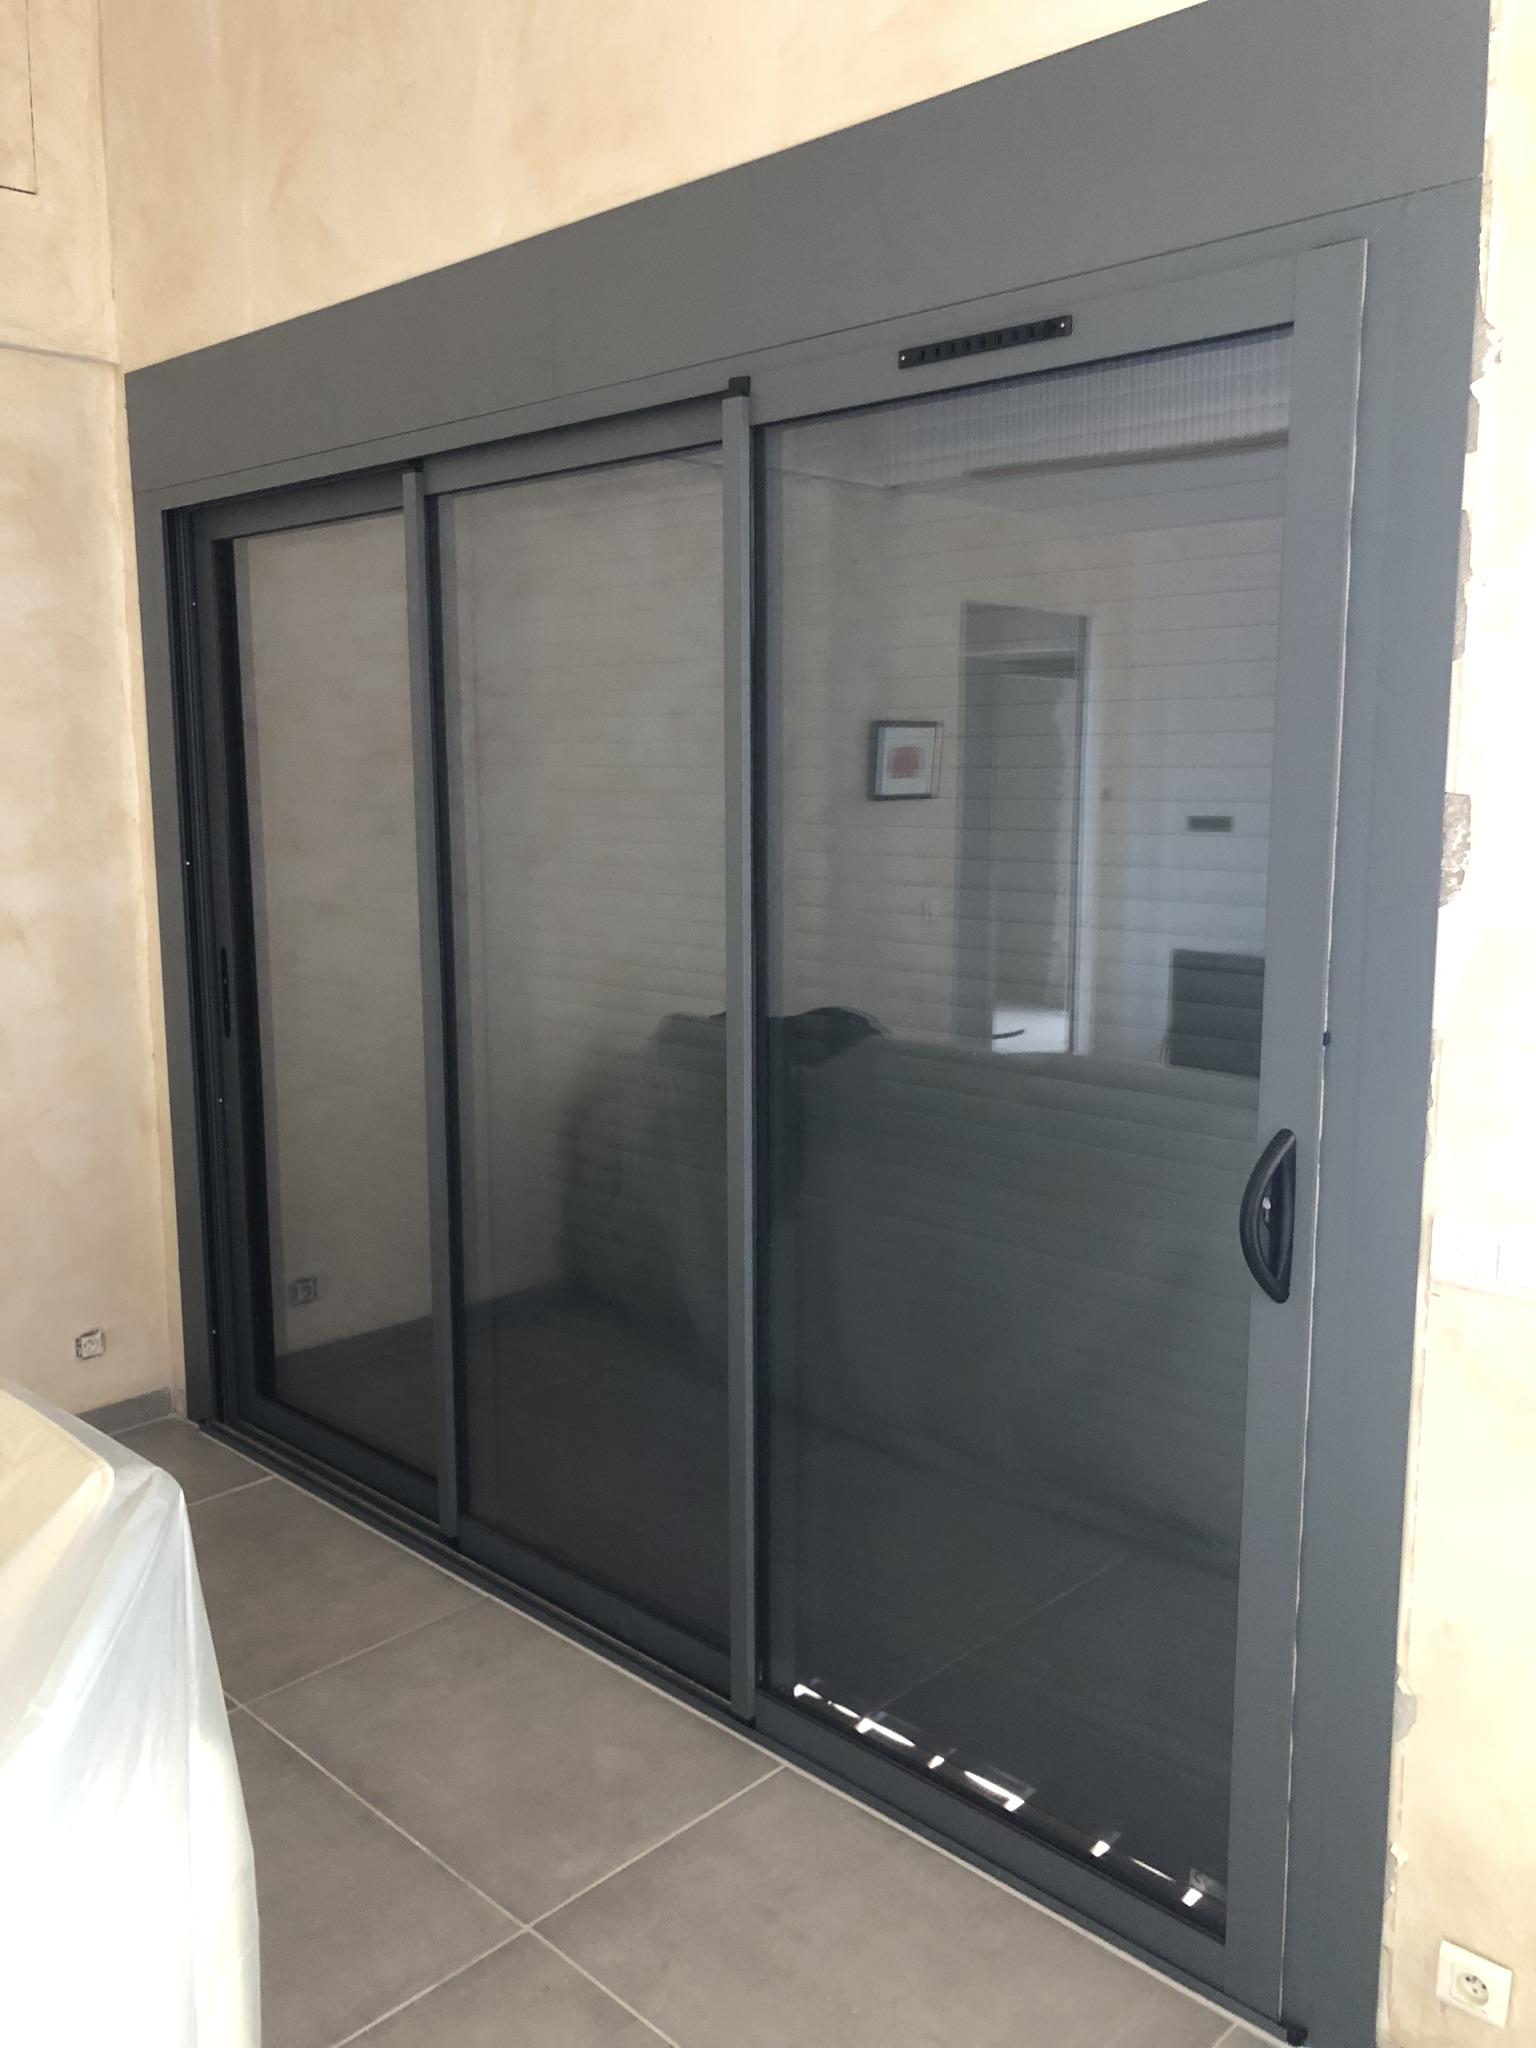 Baie coulissante aluminium Toulon (83) - Installation ...